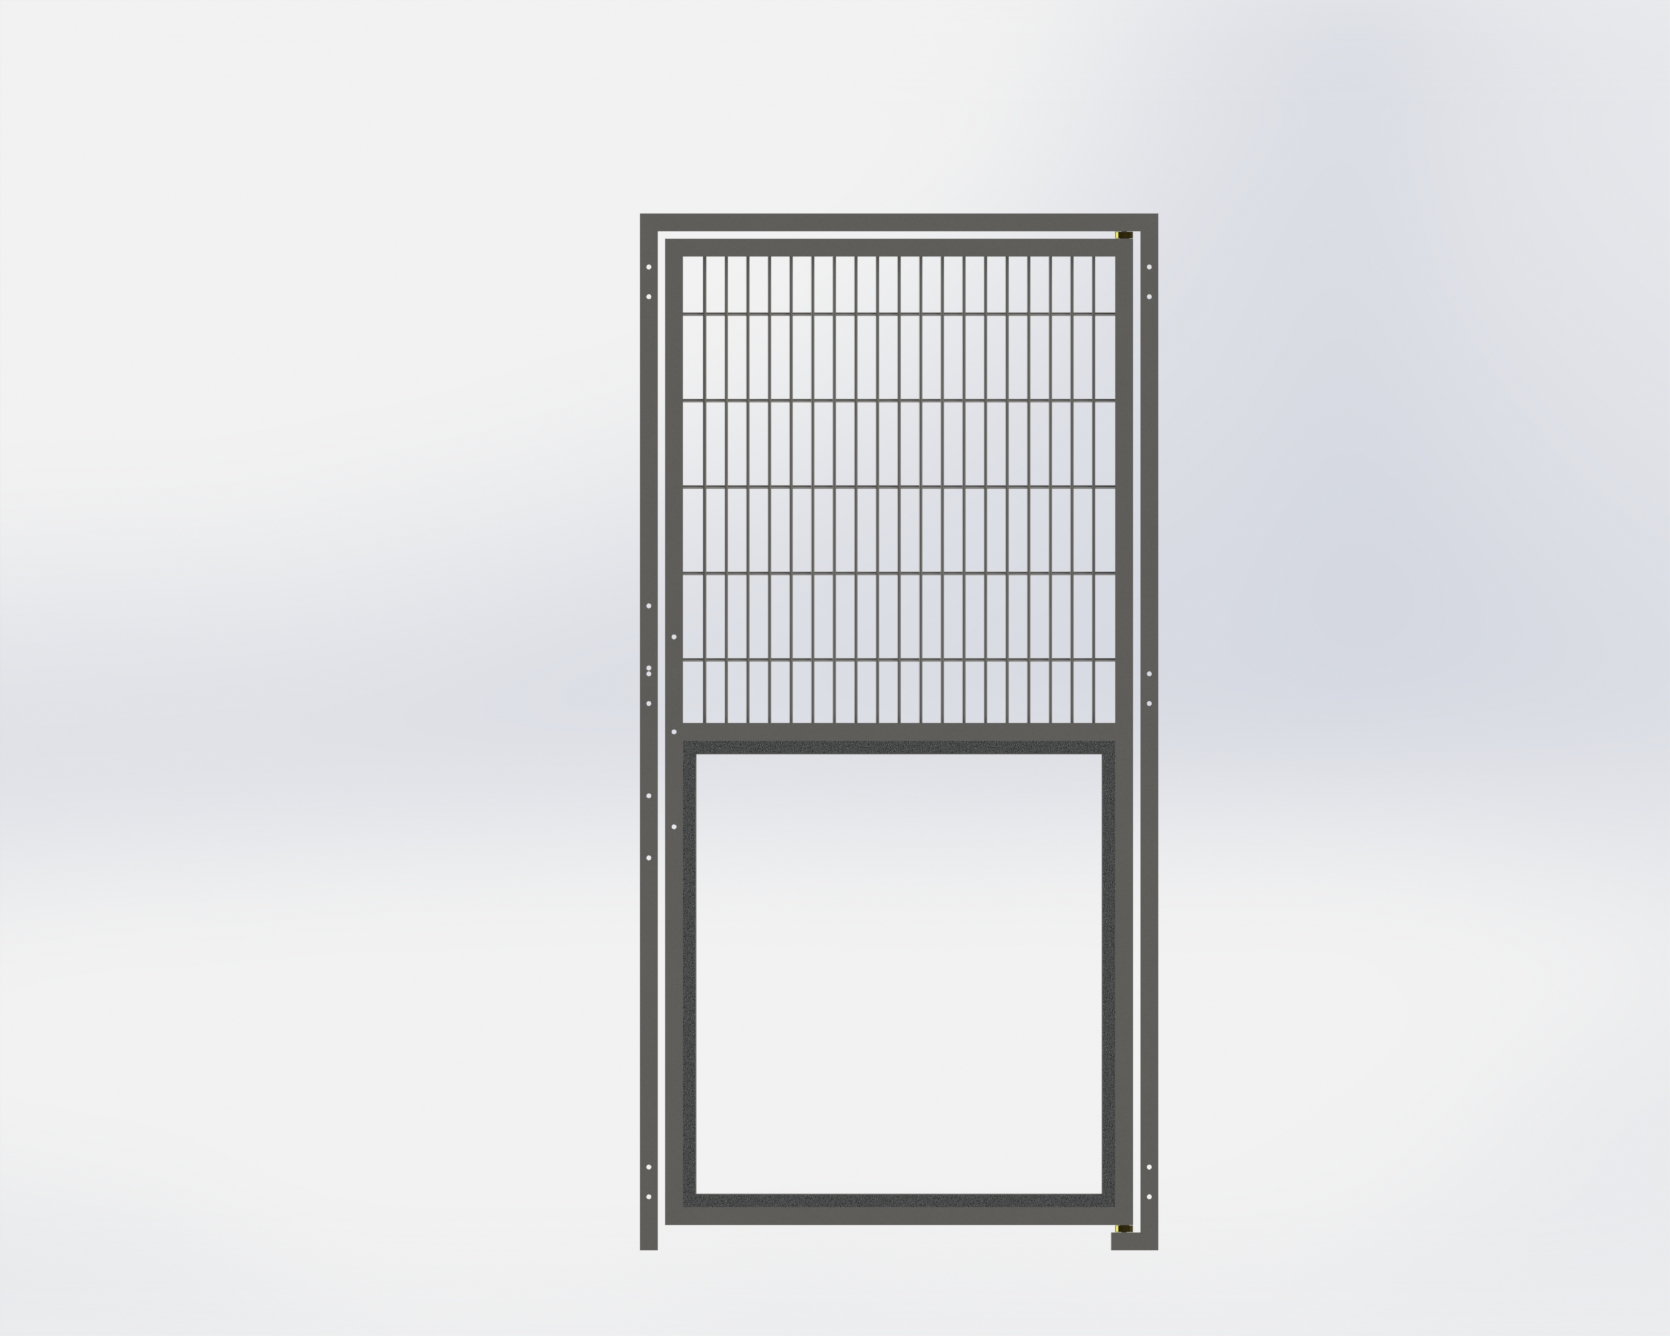 Run Gate Options